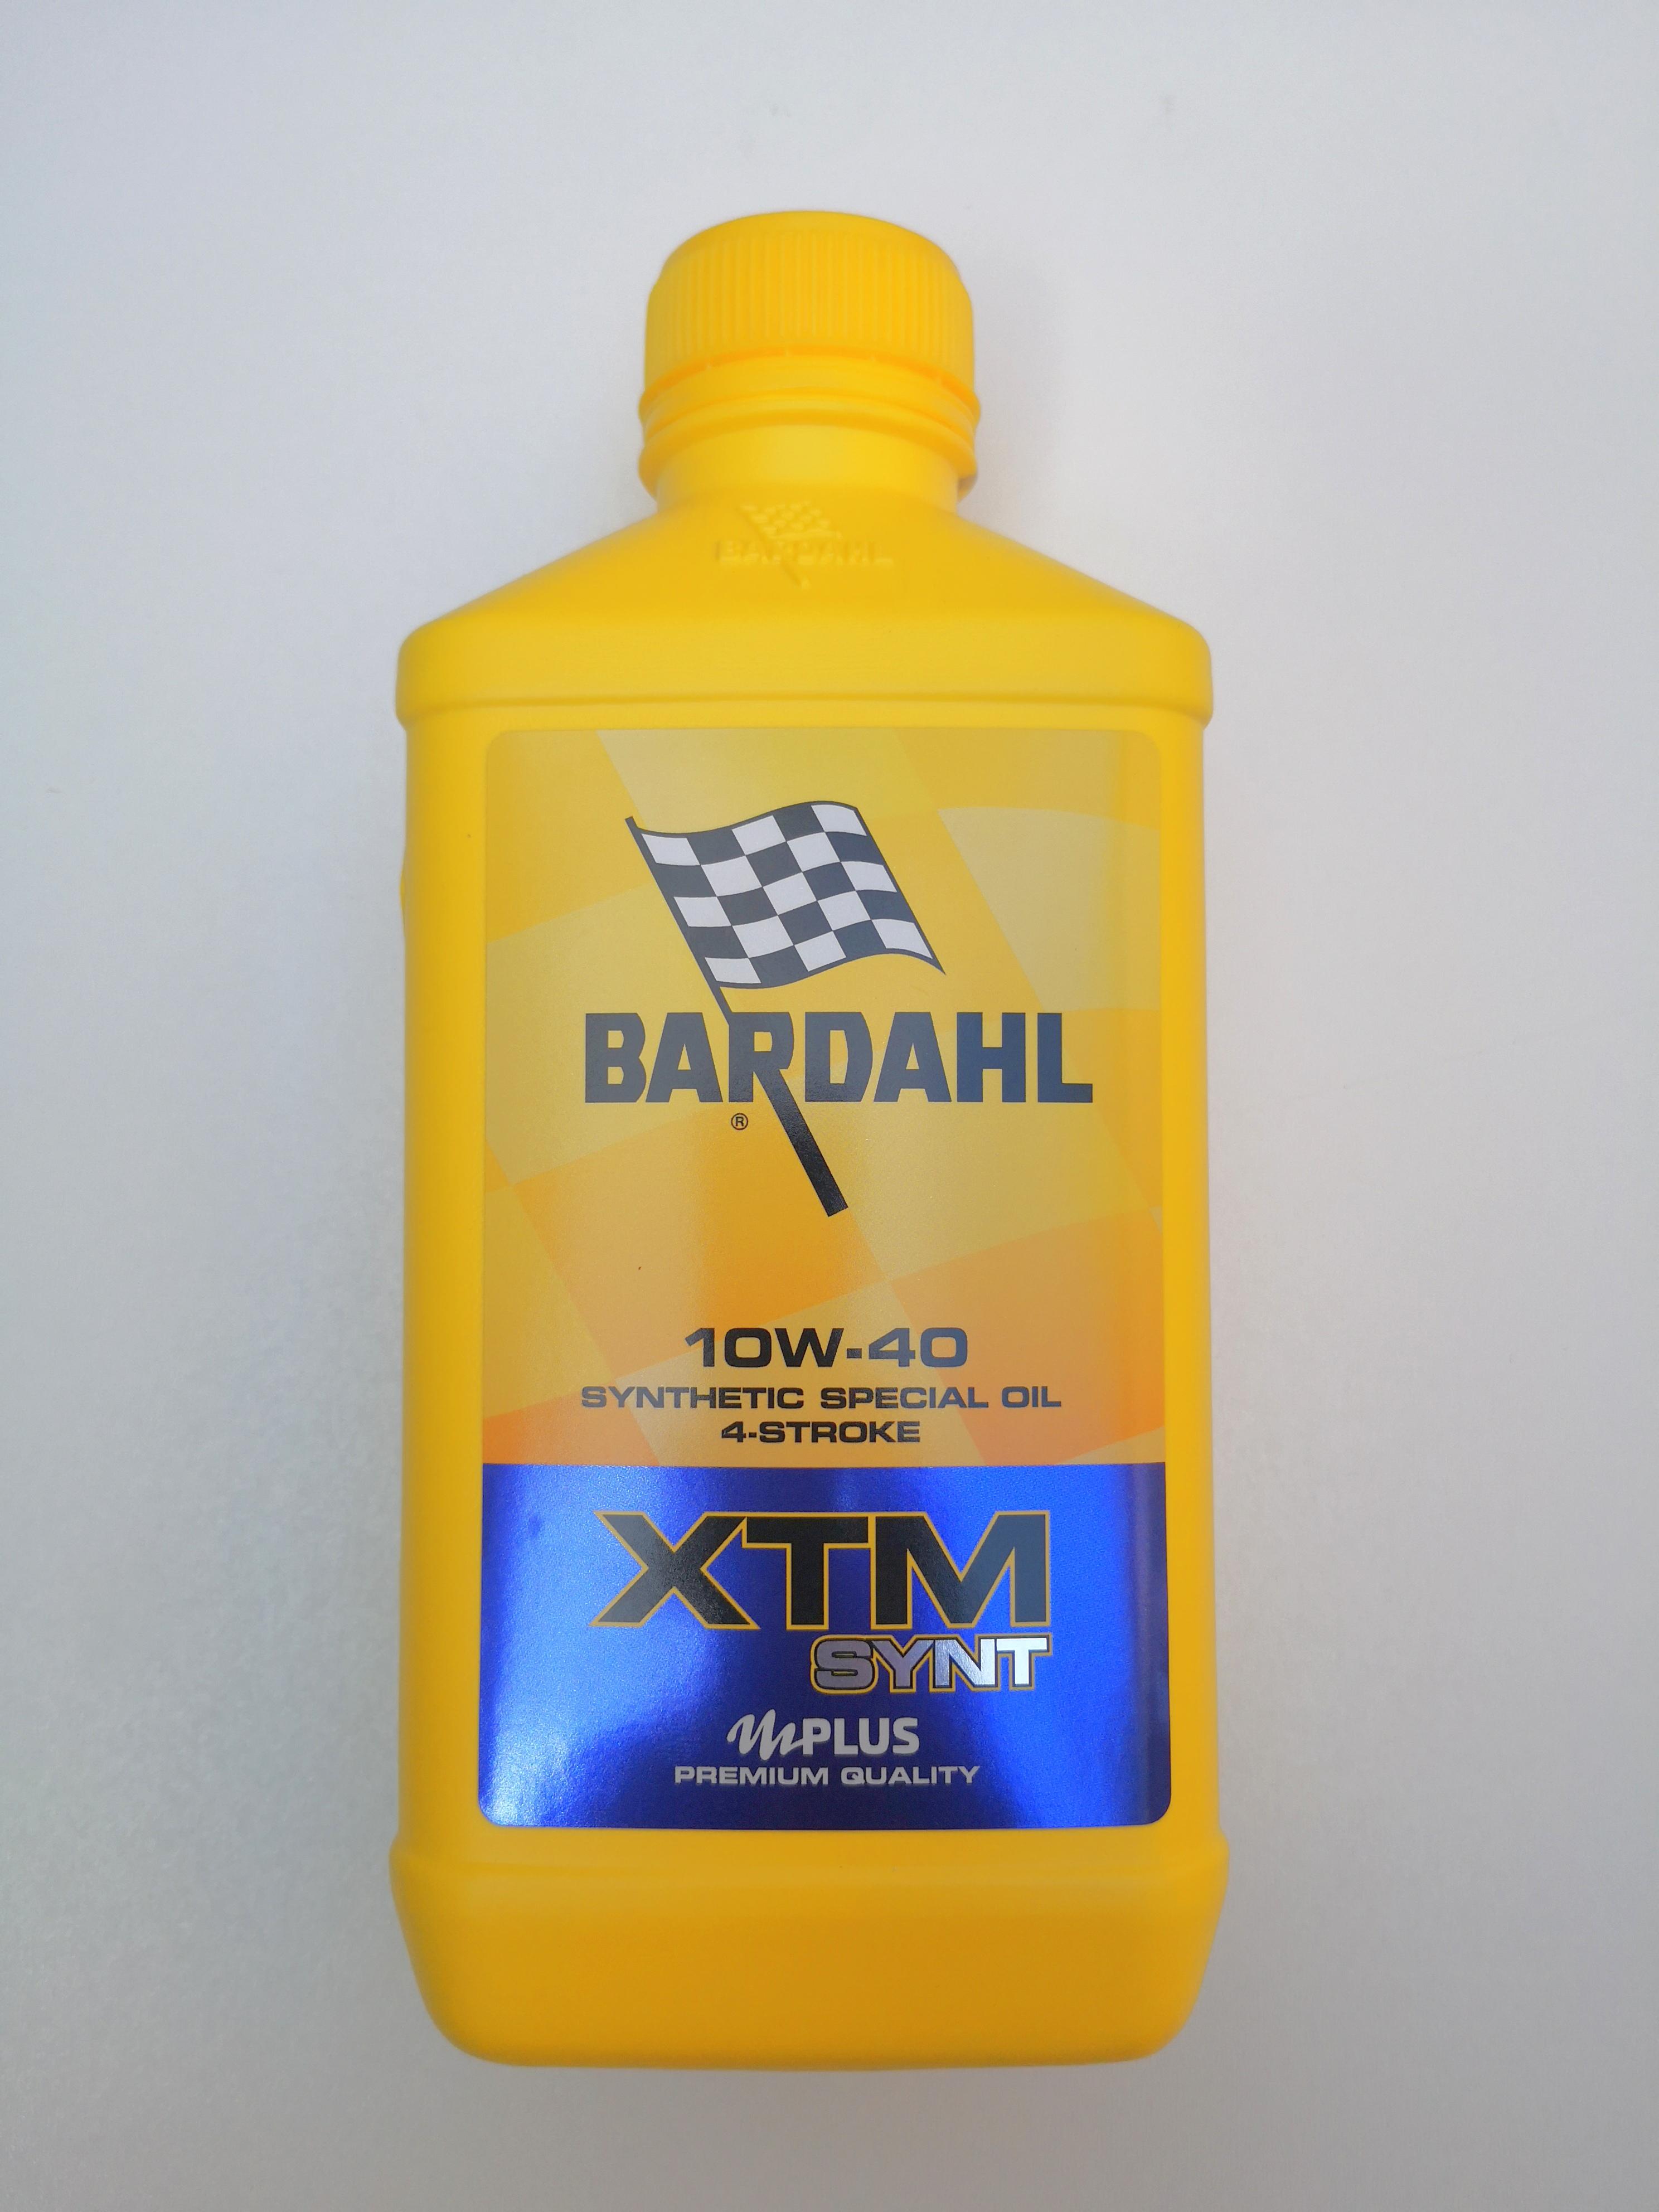 OLIO MOTORE BARDAHL XTM SYNT per MOTO e SCOOTER 4 TEMPI  - SEMISINTETICO  SAE 10W40 - MOTOFORNITURE GF